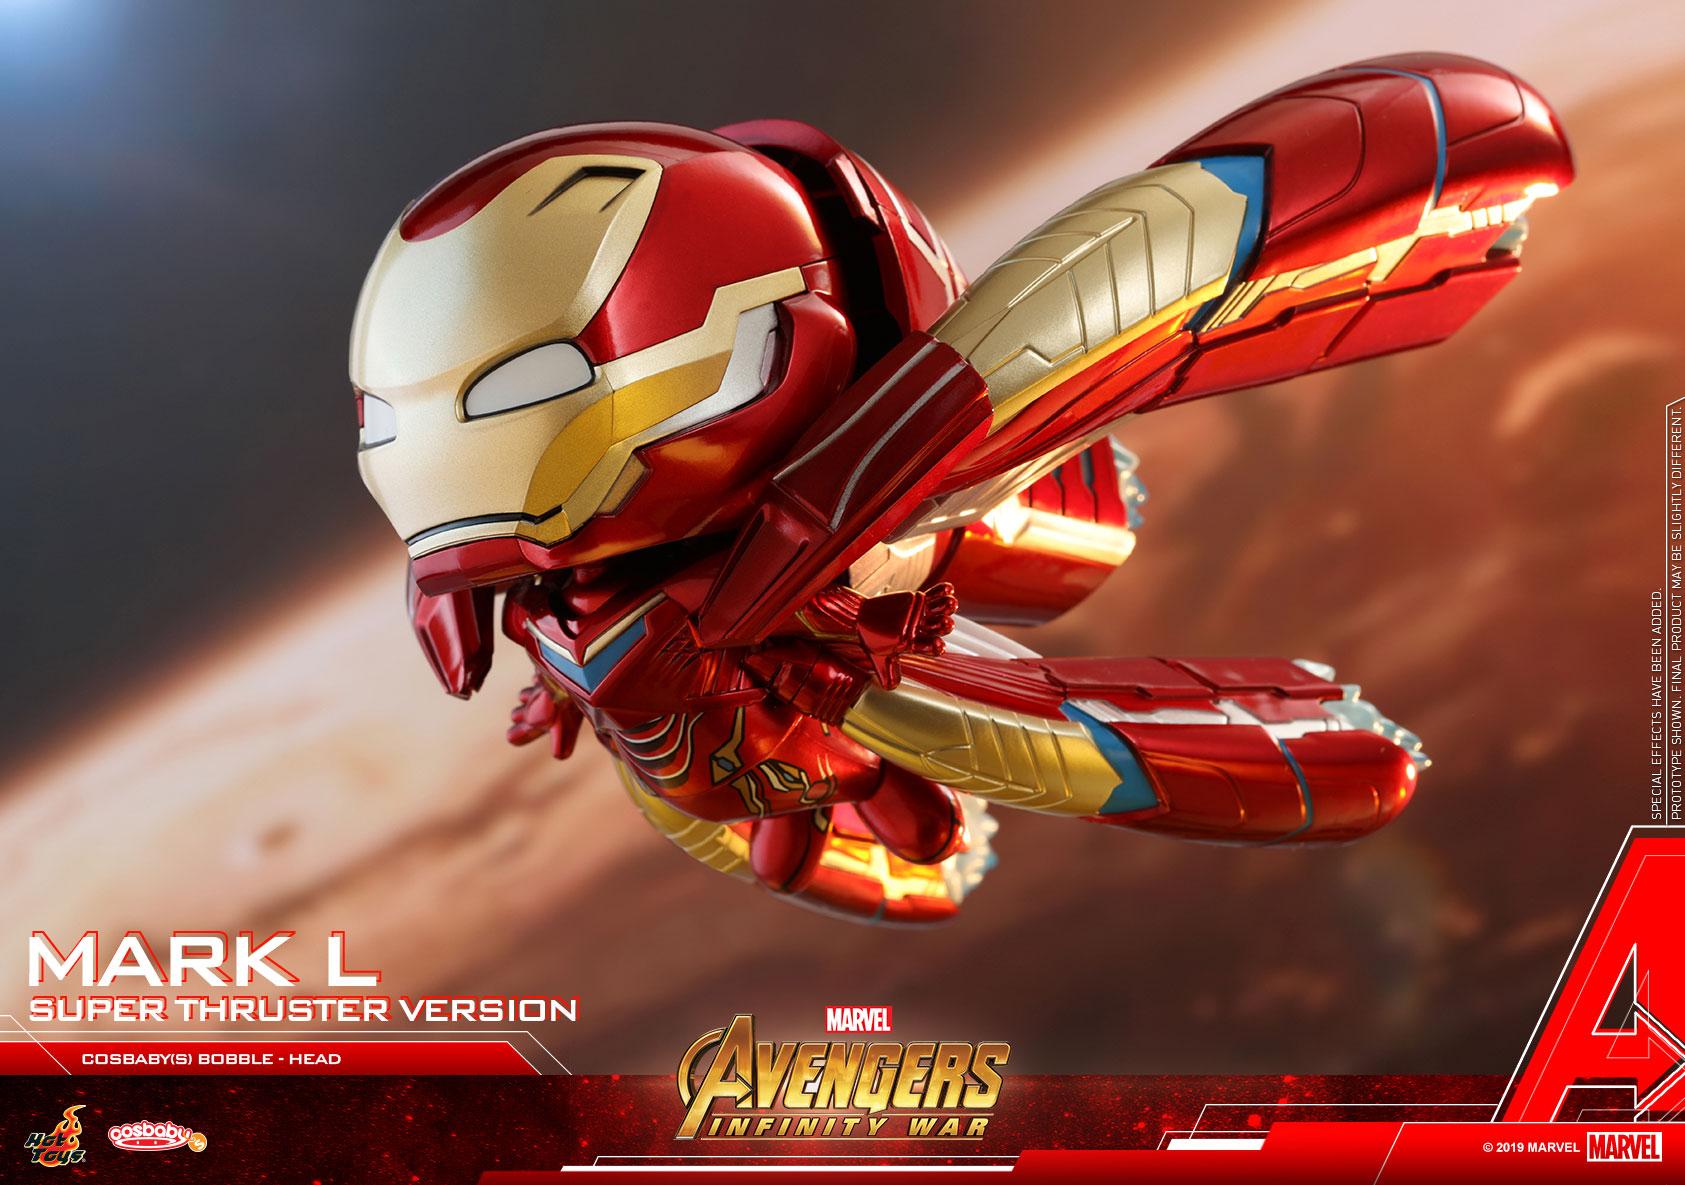 Hot-Toys---Avengers3---Mark-L-(Super-Thruster-Version)-Cosbaby-(S)_PR3